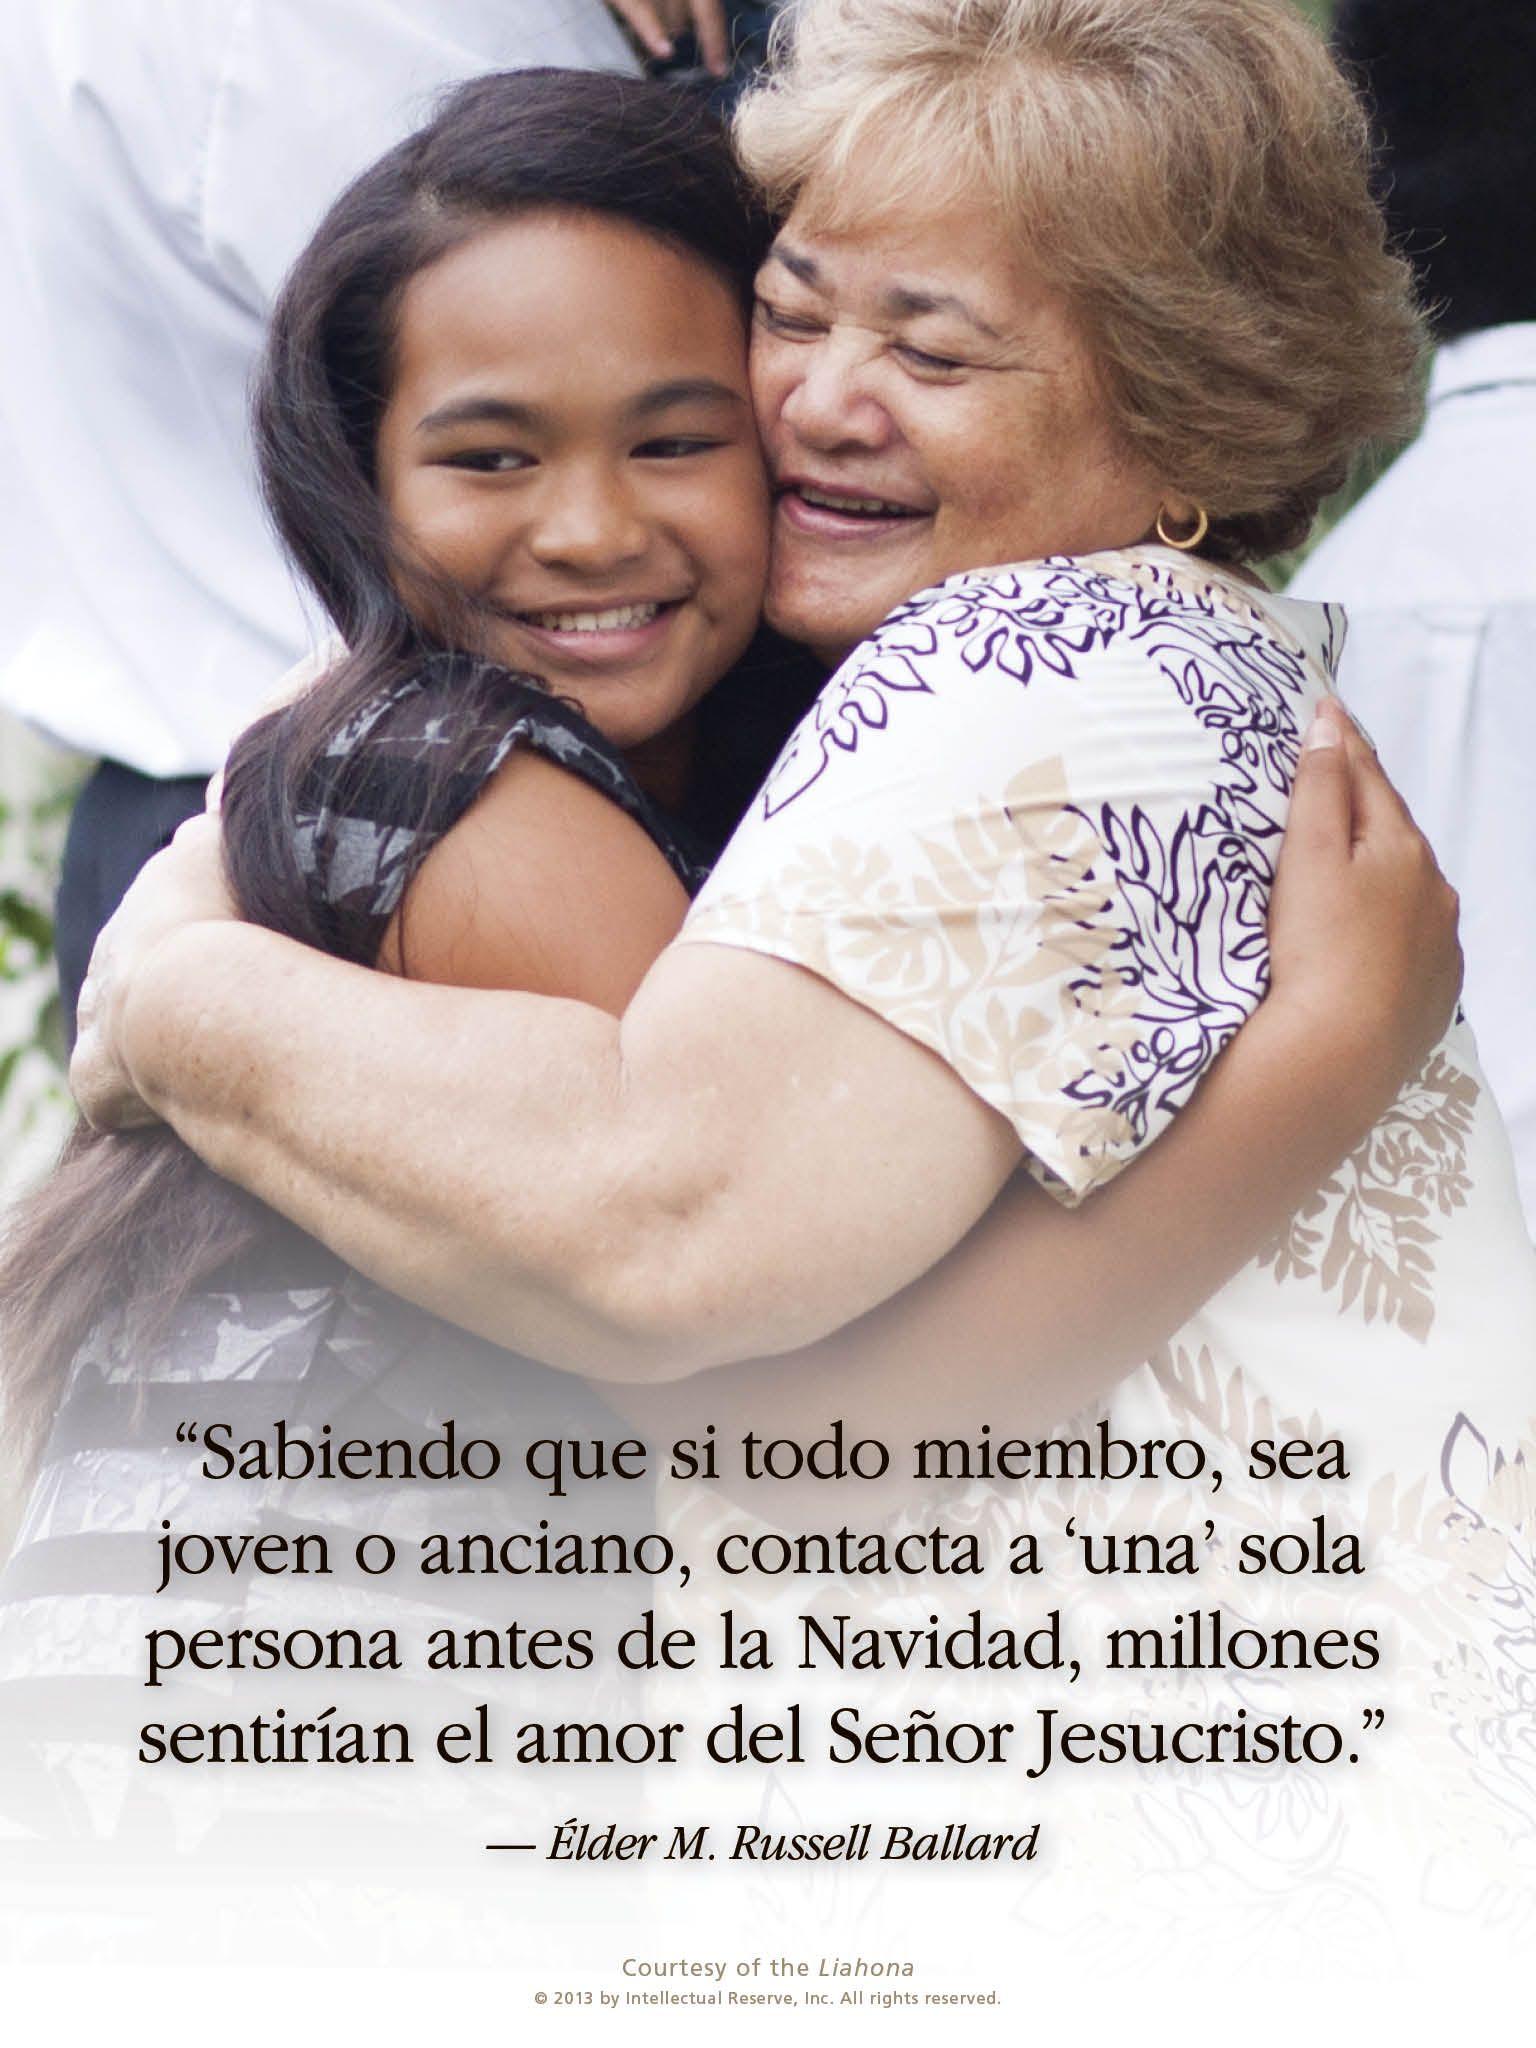 #SUD #LDS #Espanol https://www.facebook.com/liahona.magazine?fref=ts